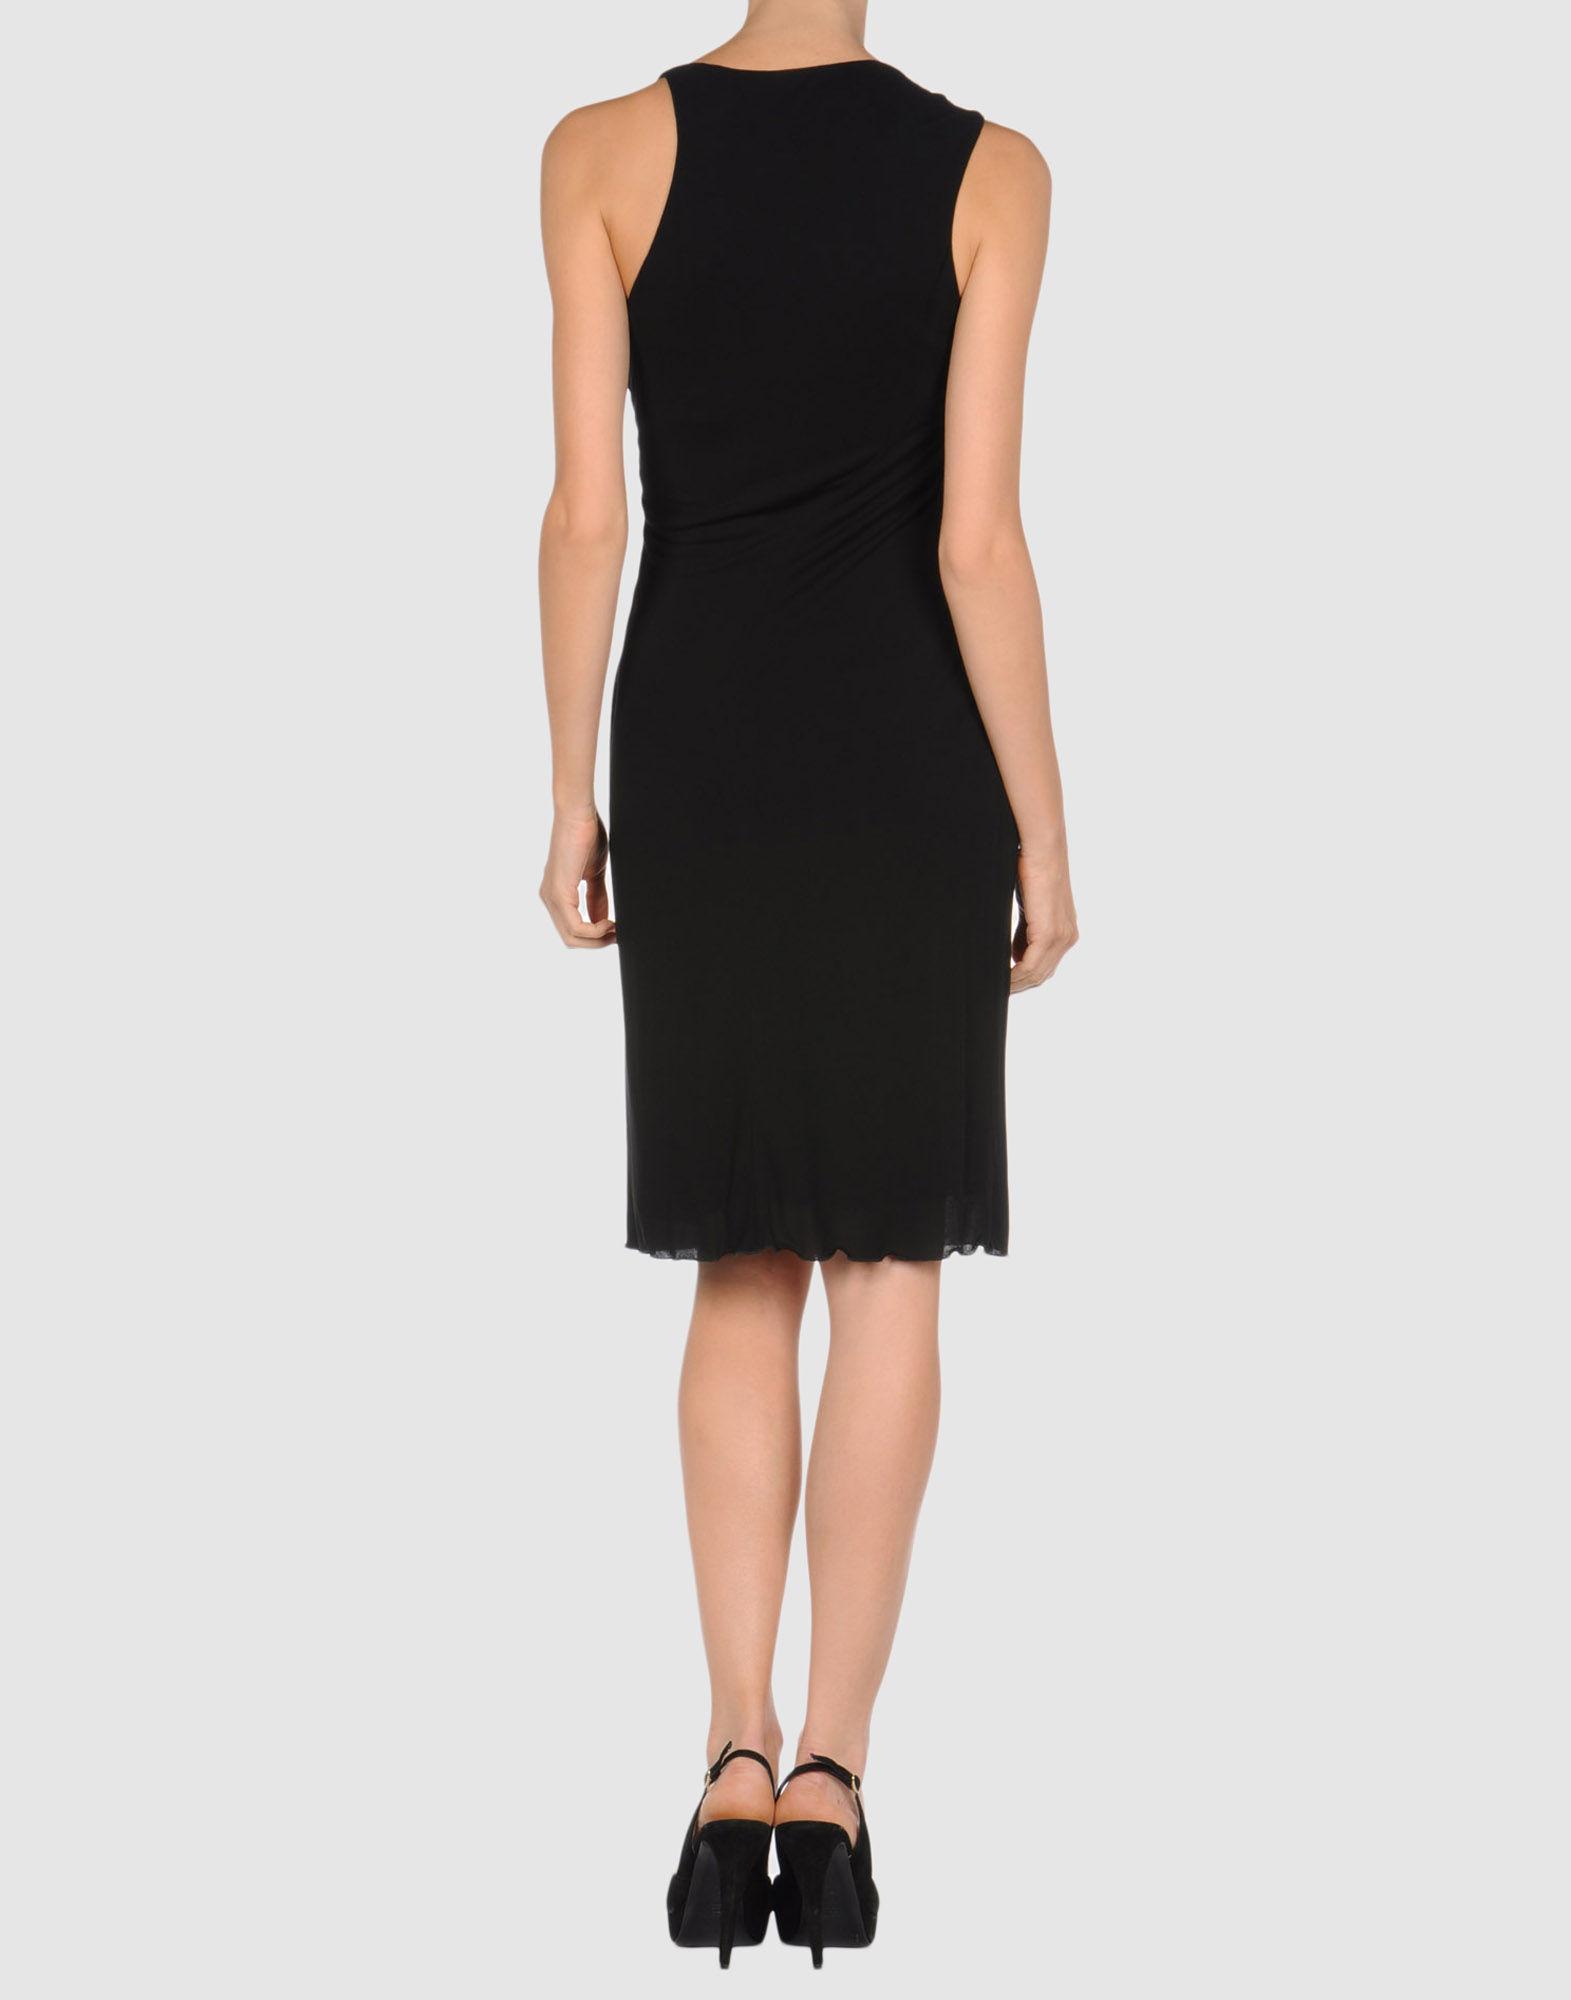 34224985FL 14 r - Evening Φορεματα Versace 2011 2012 Κωδ.12